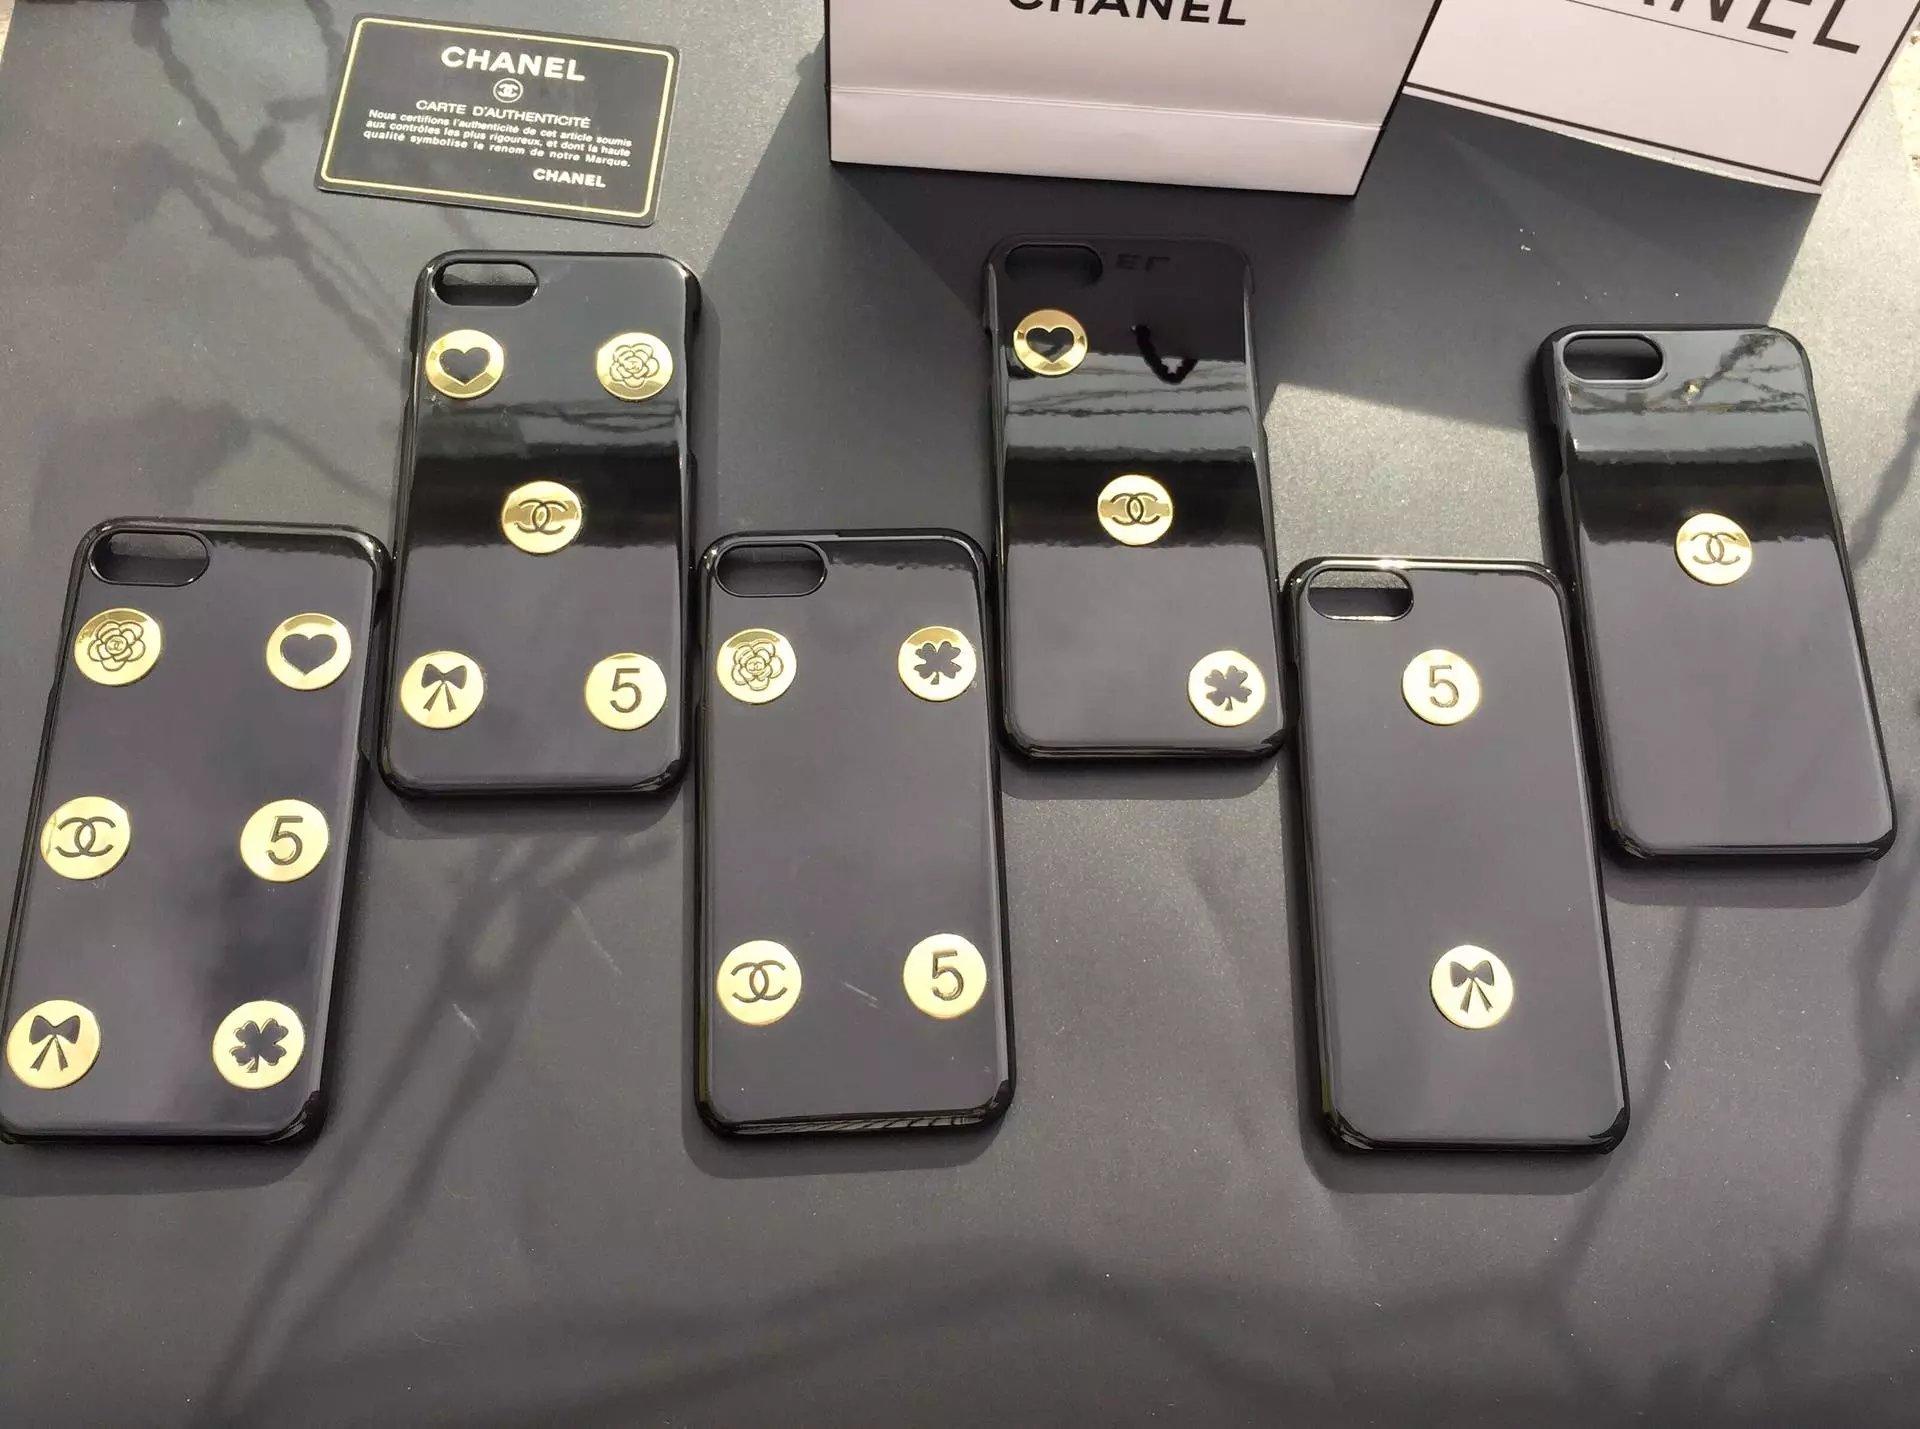 iphone hülle selbst gestalten iphone hülle holz Chanel iphone 8 hüllen iphone 82 hülle iphone 8 a8 test hülle 8lber designen handyhülle 8lbst gestalten iphone 8 handytasche iphone 8 leder filztasche iphone 8